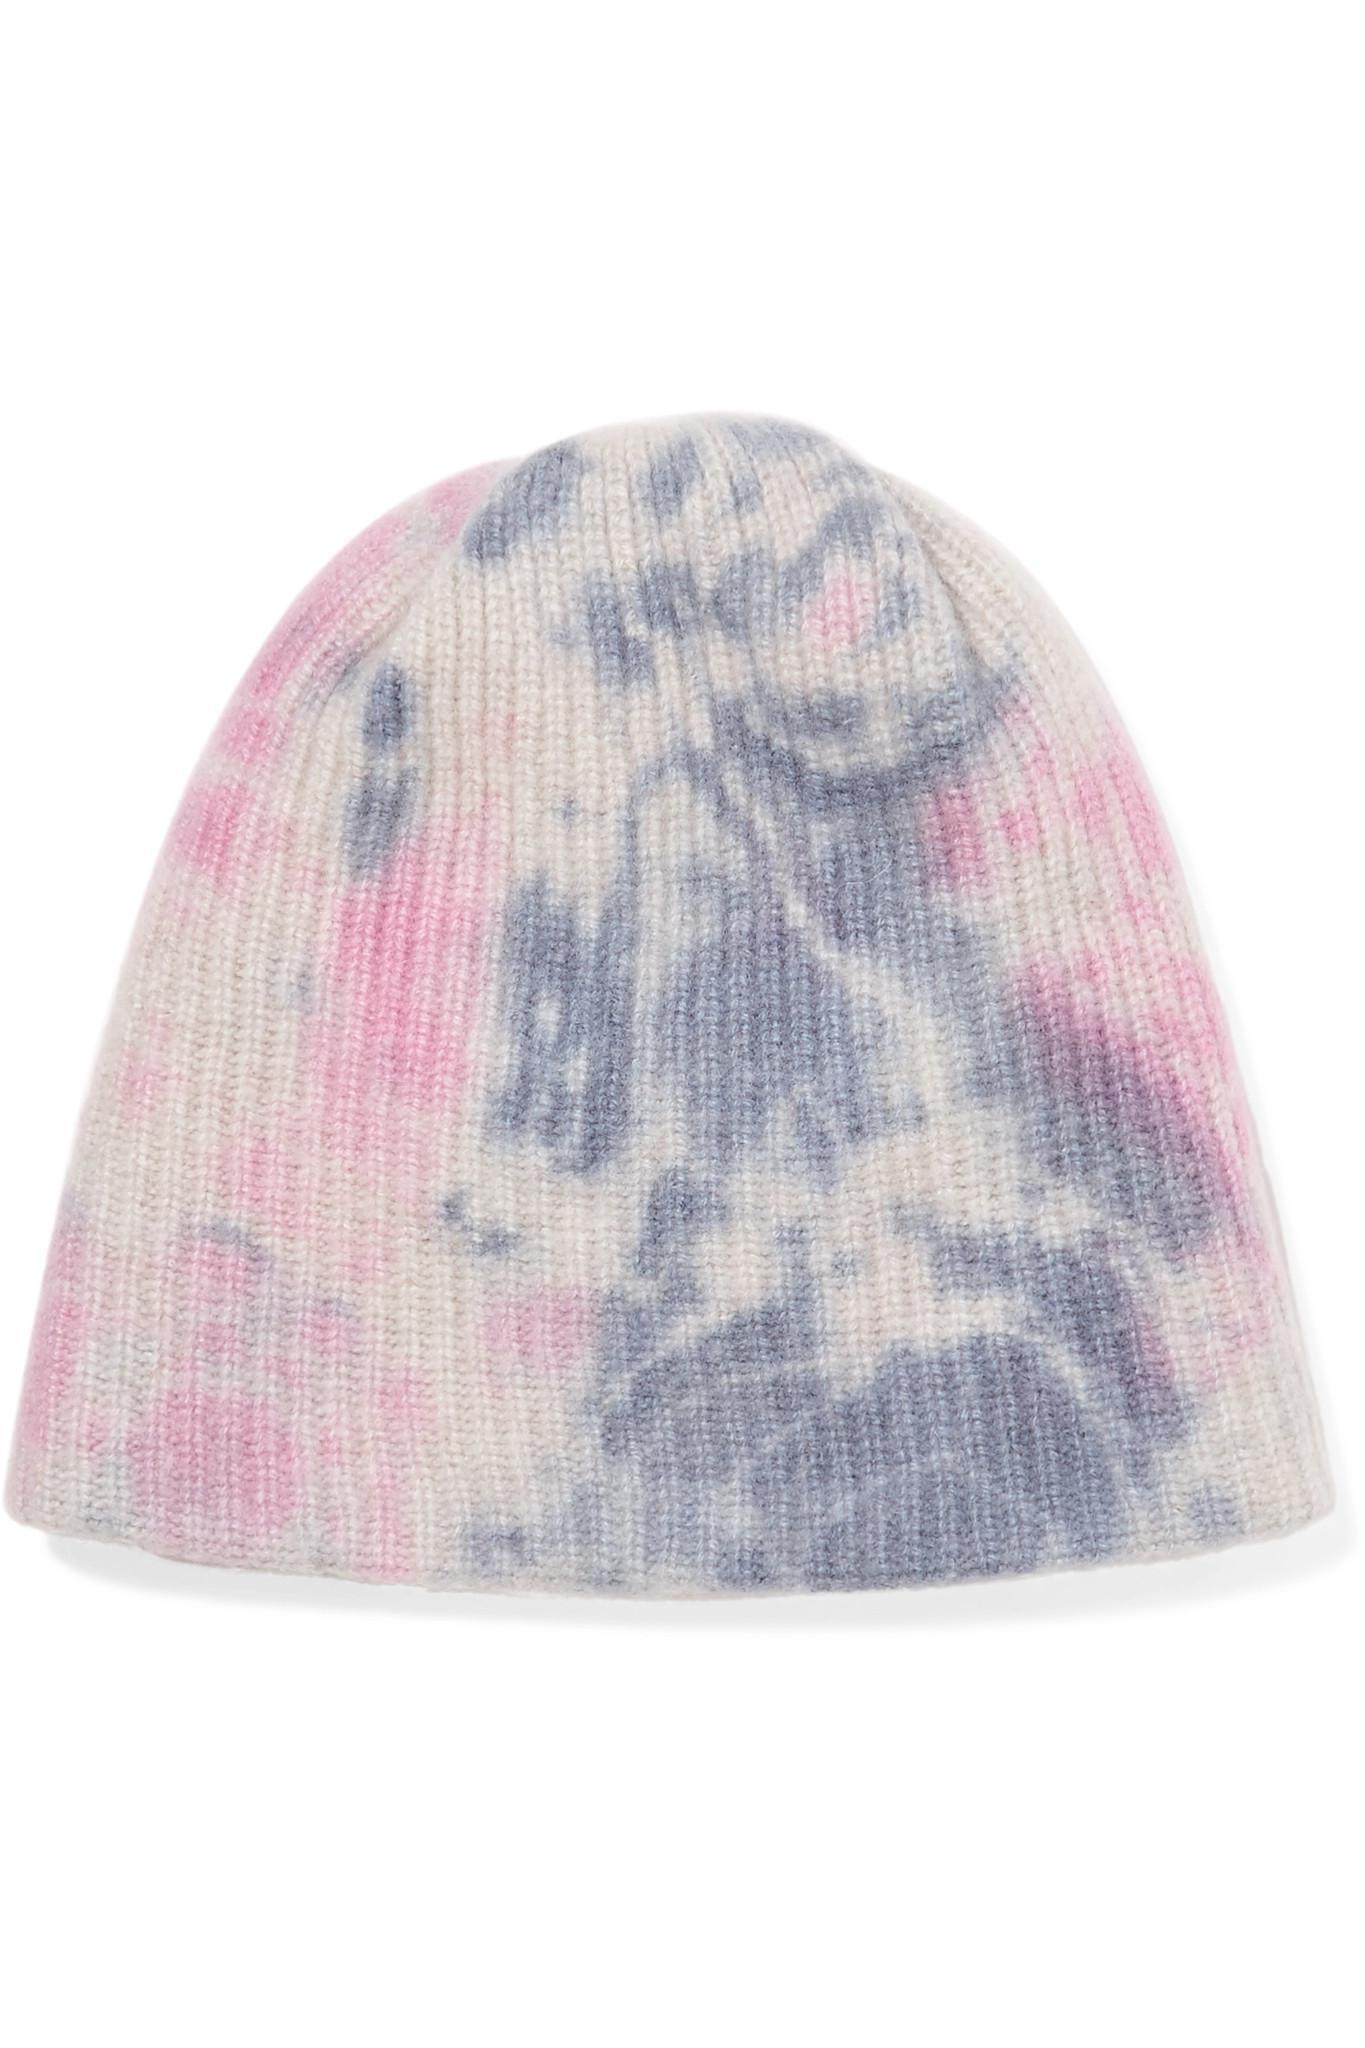 Watchman Tie-dyed Ribbed Cashmere Beanie - Pink The Elder Statesman NyTJEDOPrW